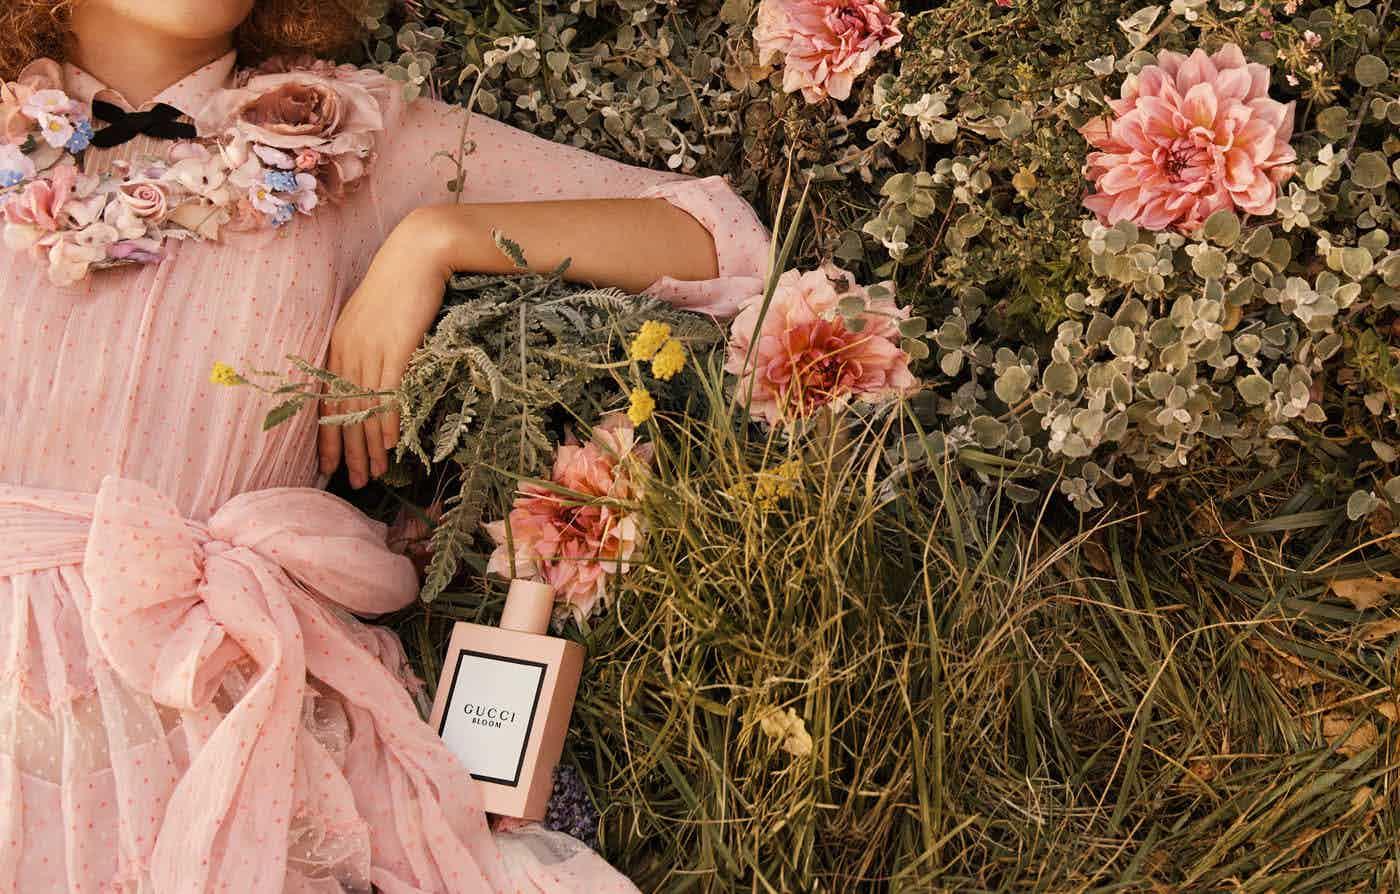 GUCCI  - Bloom Photographer: Glen Luchford Model: Dakota Johnson, Hari Nef, Petra Collins Stylist: Joe McKenna Location: Los Angeles, US